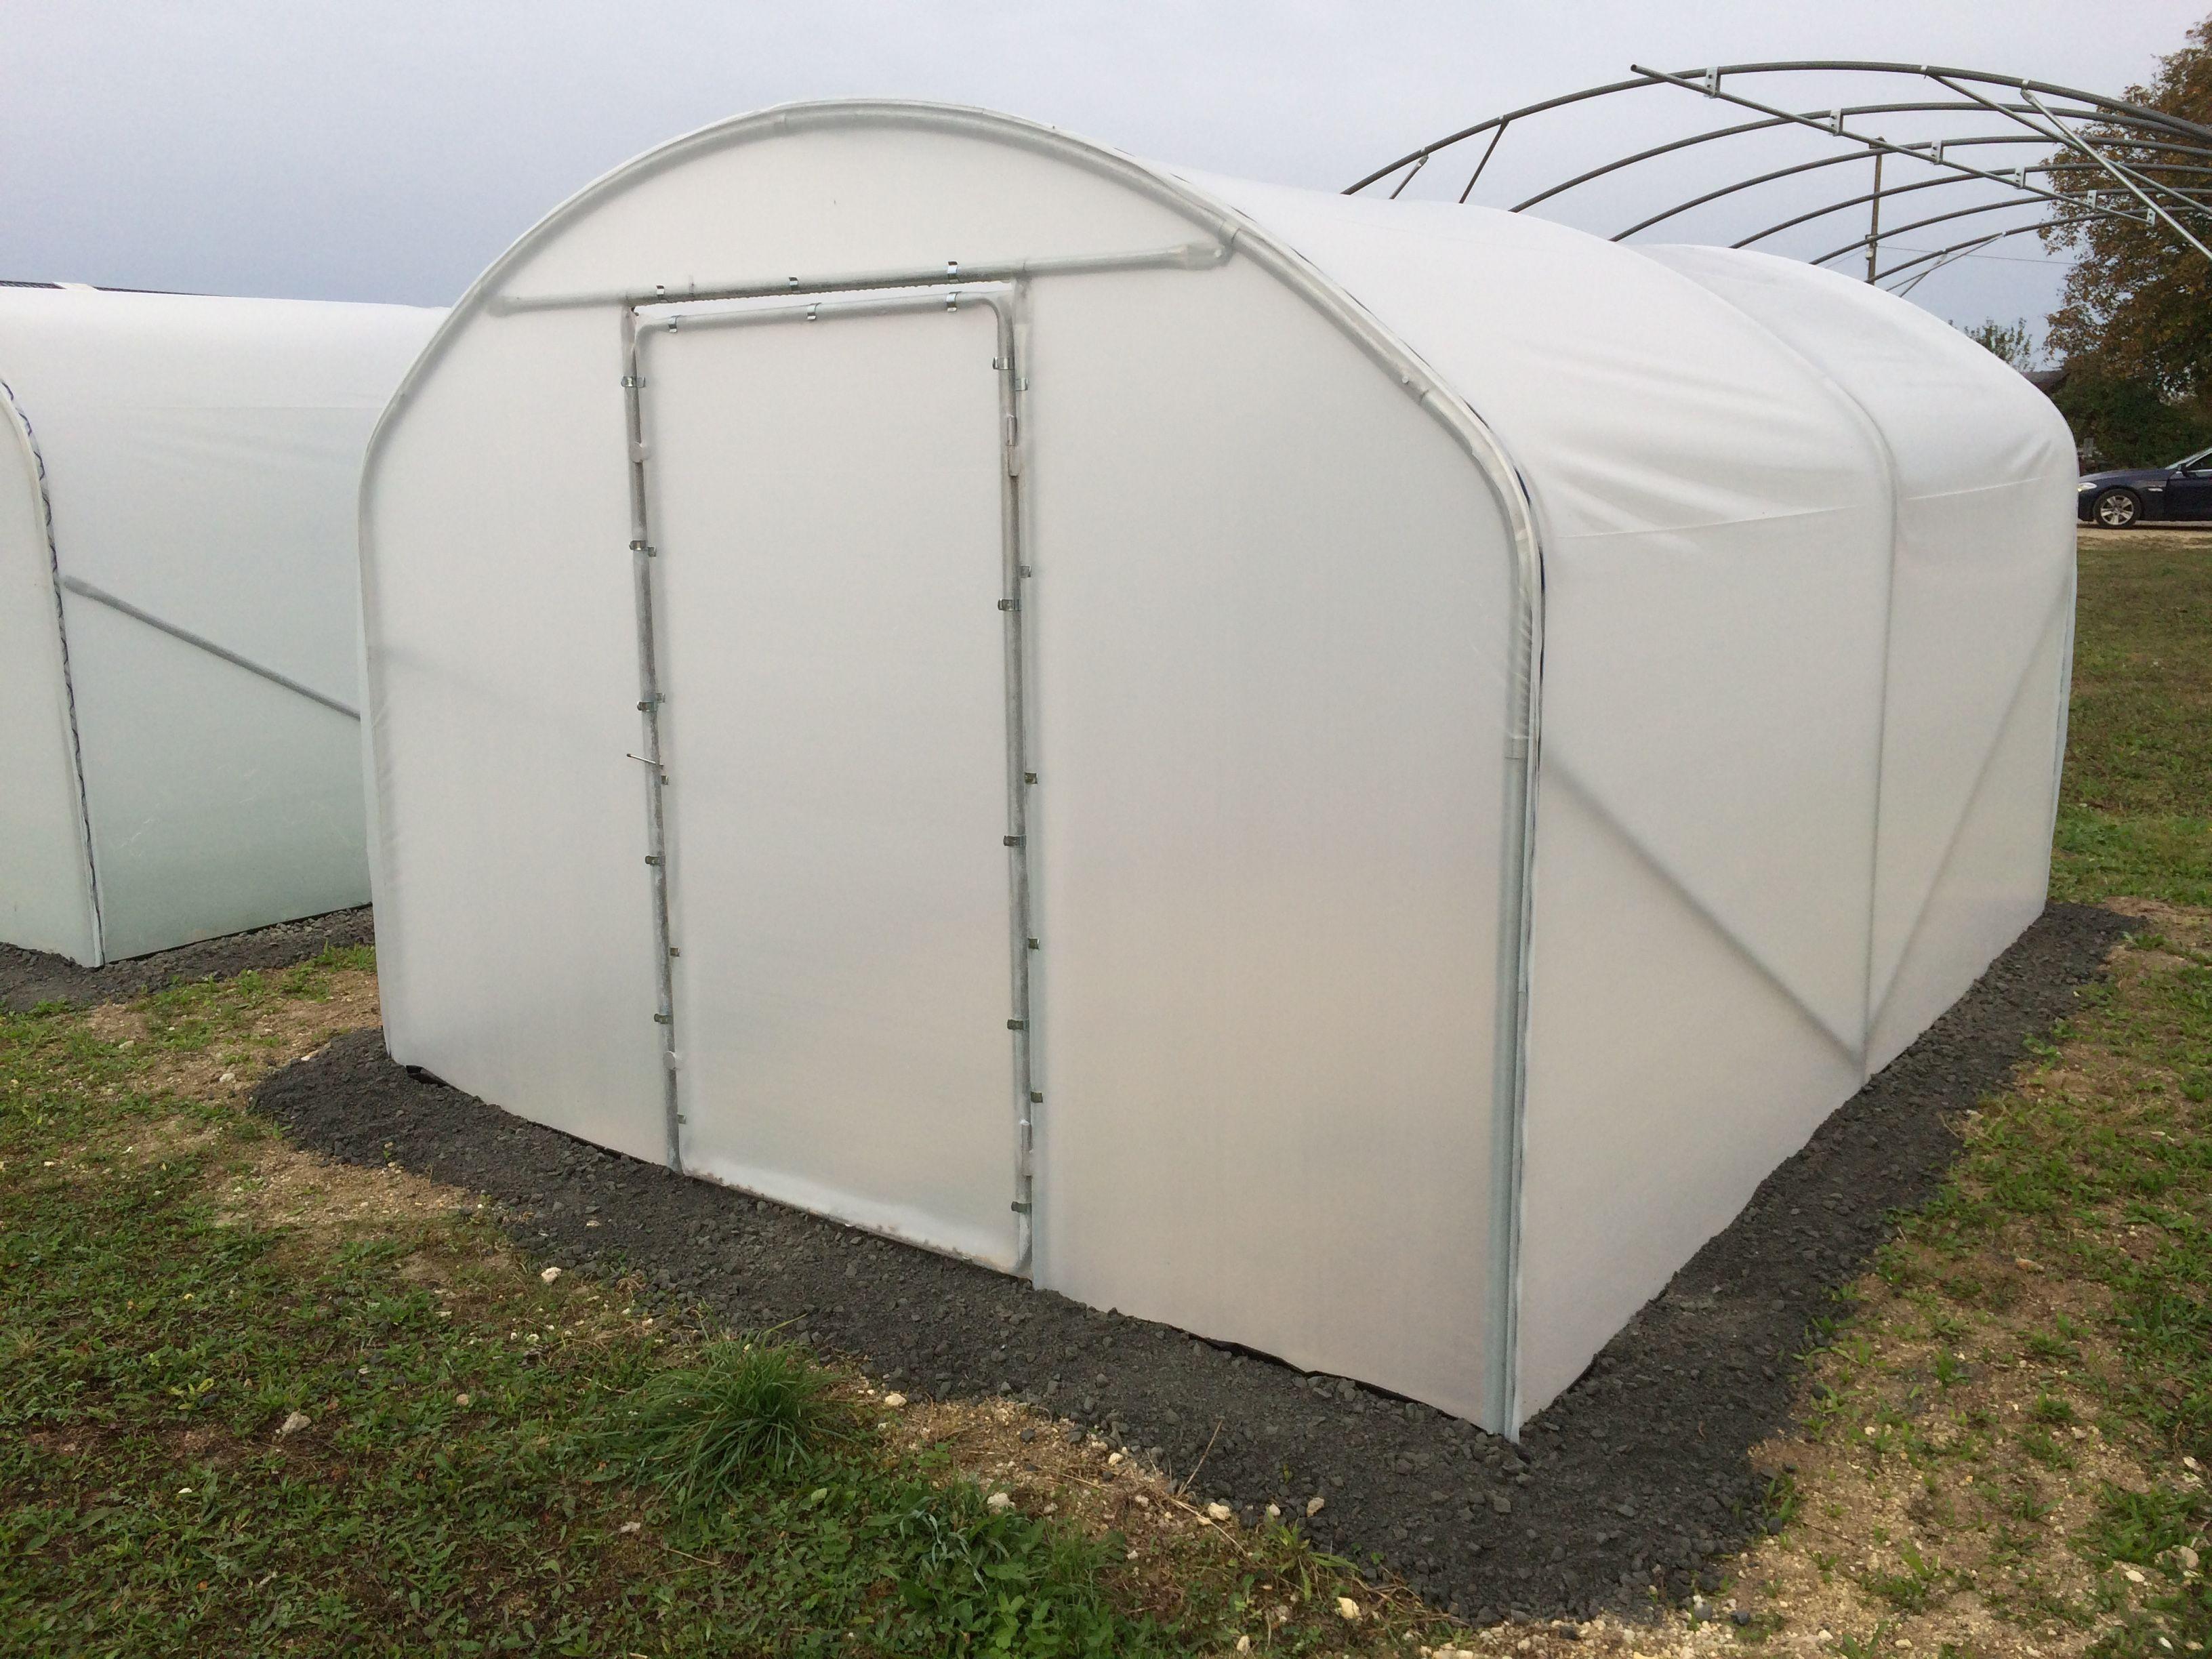 Serre de jardin largeur 3 m¨tres